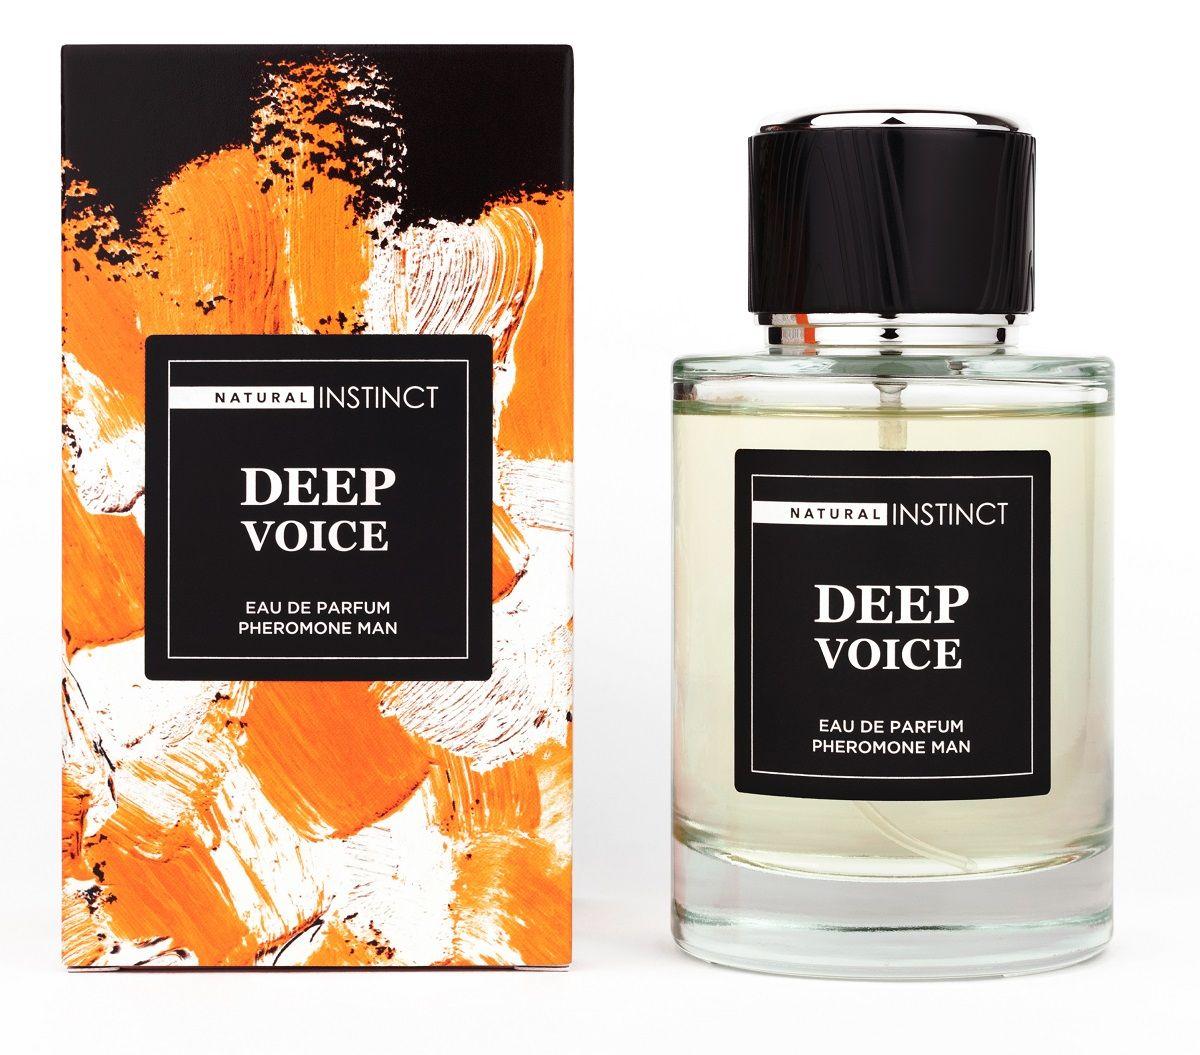 Парфюмерная вода с феромонами Deep Voice - 100 мл. - фото 369054